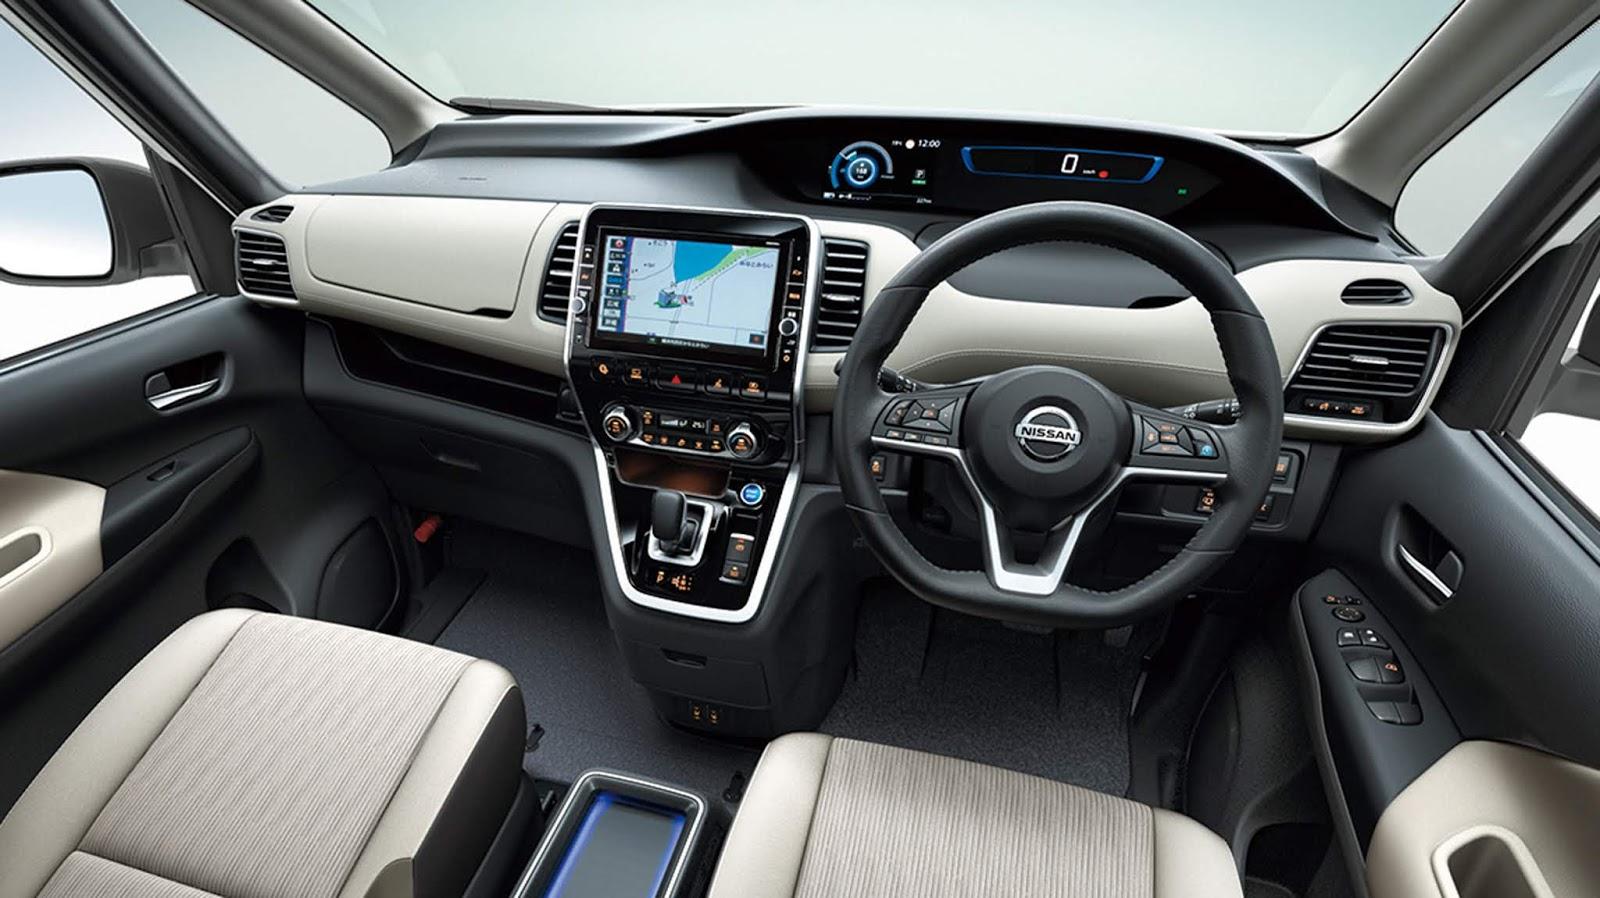 Nissan Serena e POWER 1 Βραβείο τεχνολογίας για το e-POWER της Nissan Electric cars, Nissan, βραβείο, Τεχνολογία